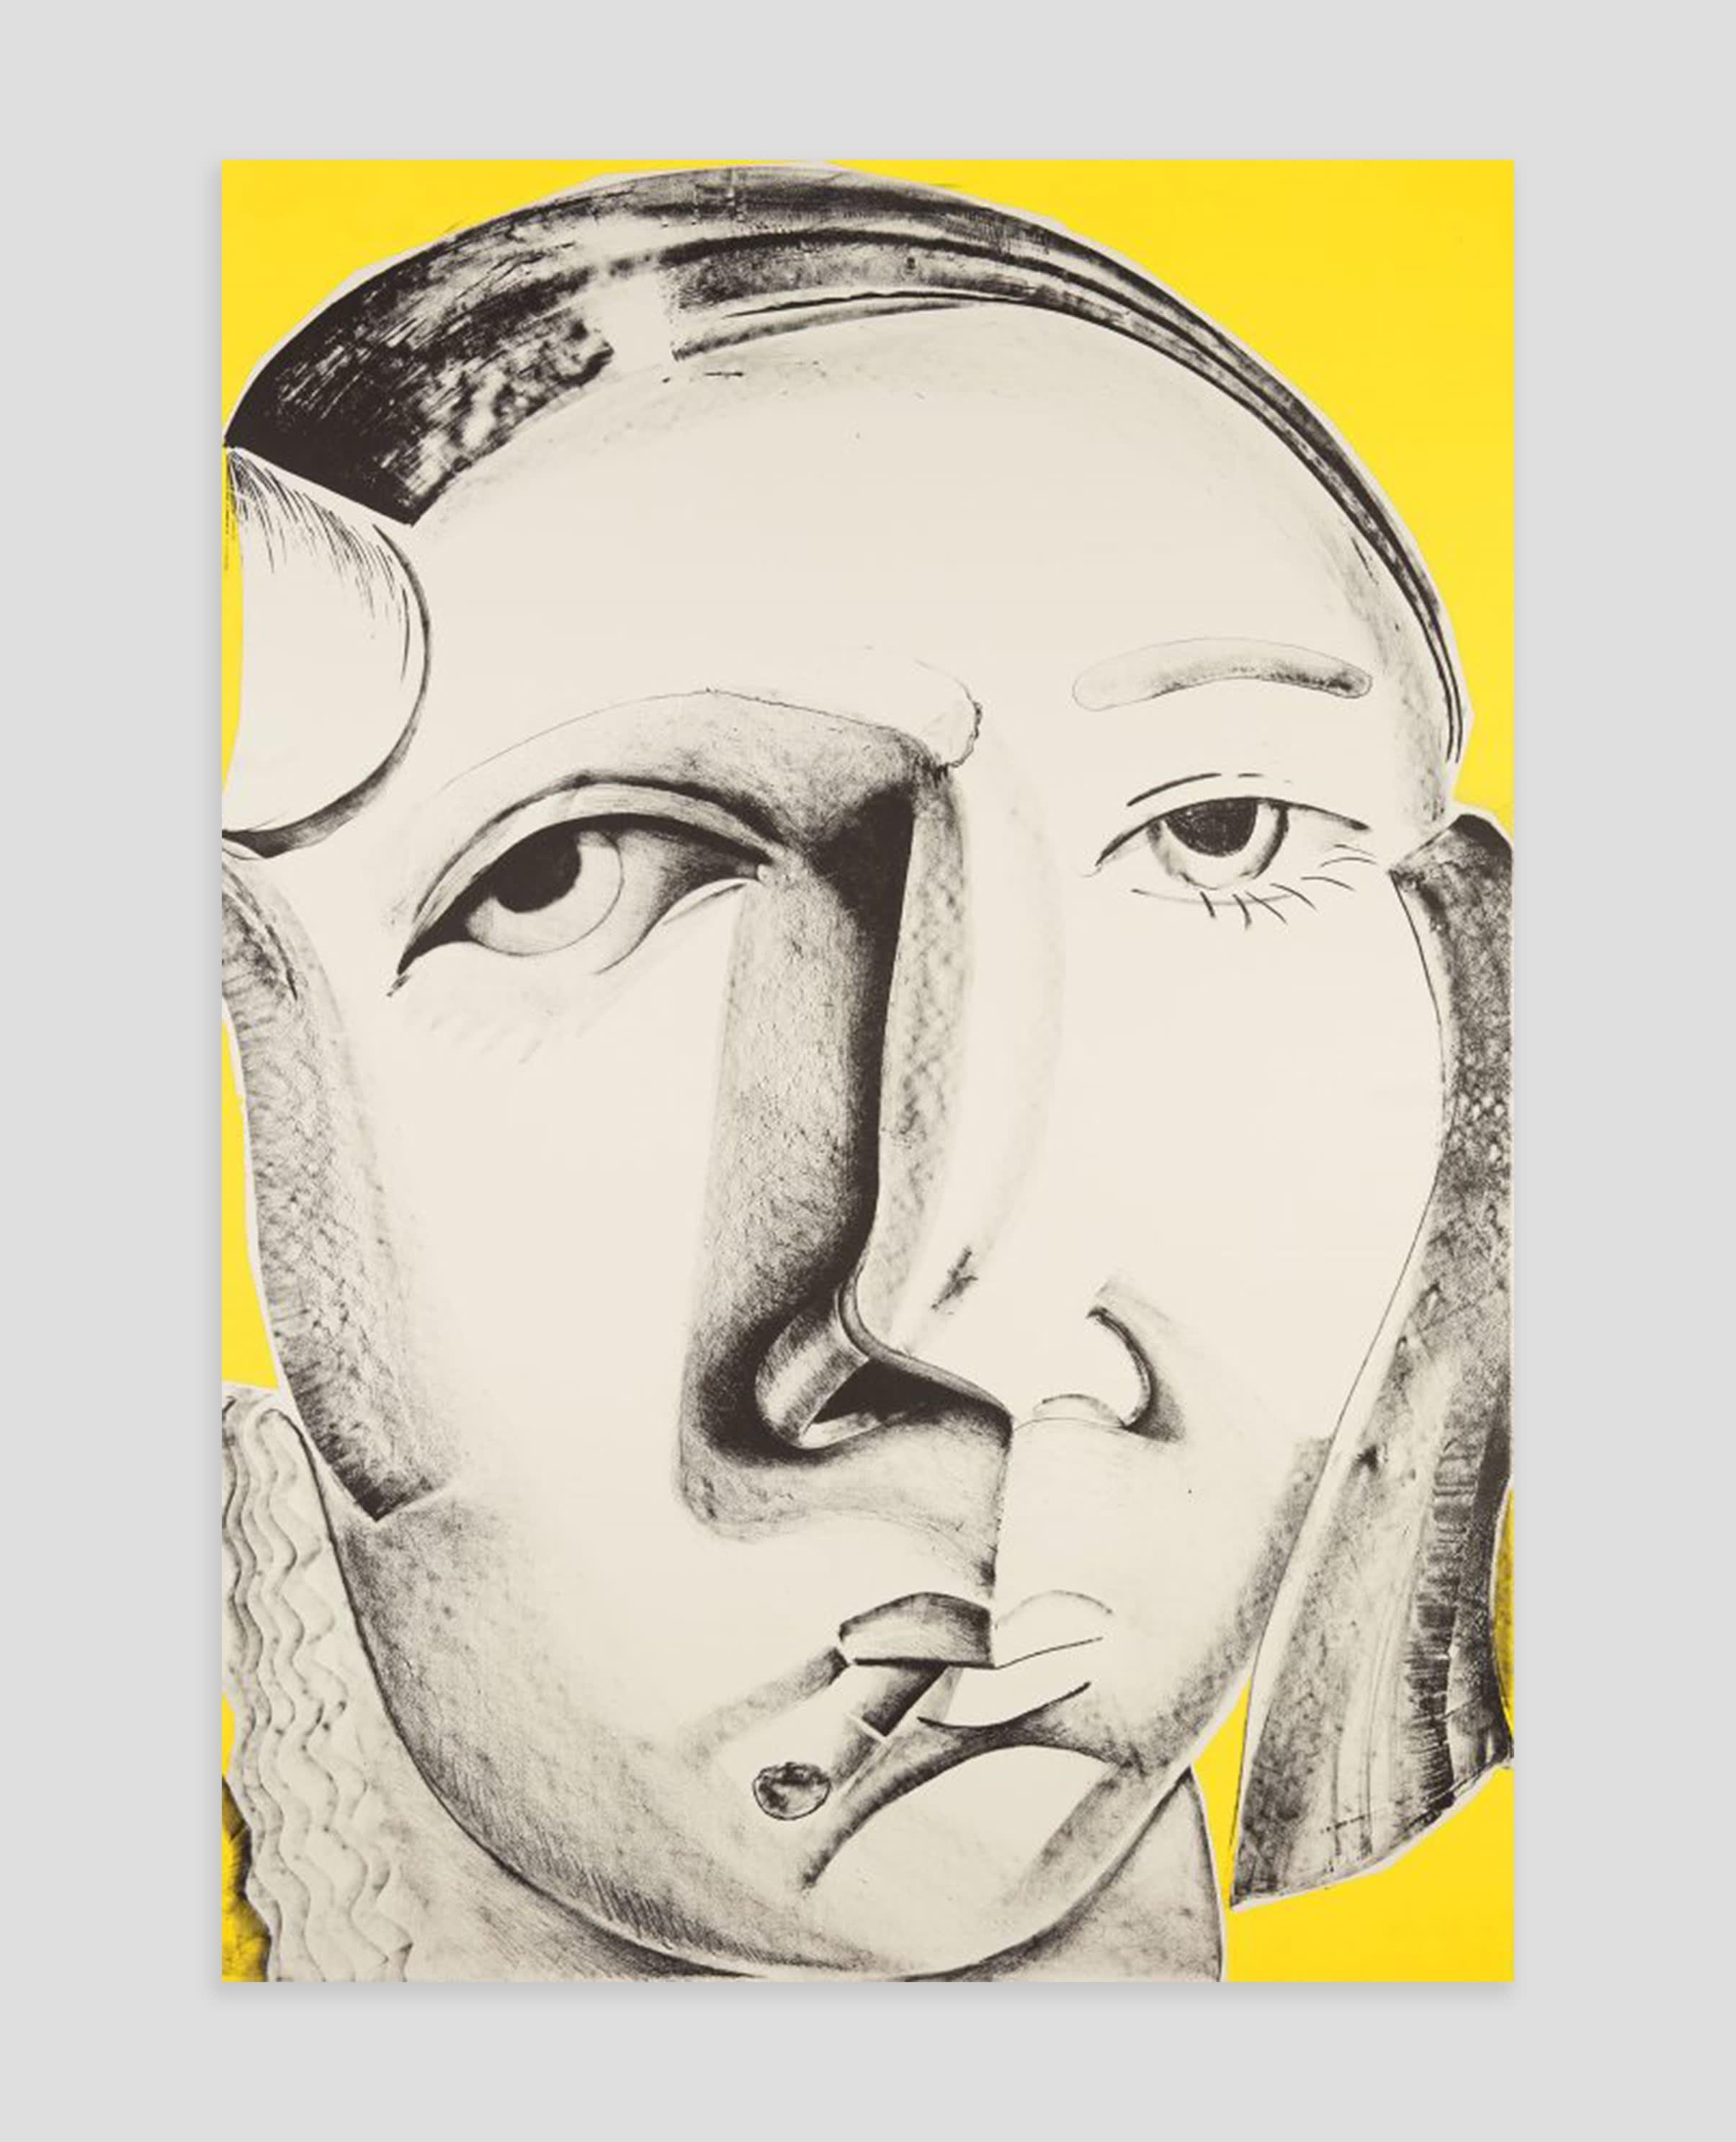 Fine Art Print by Danielle Orchard at Zane Bennett Contemporary Art